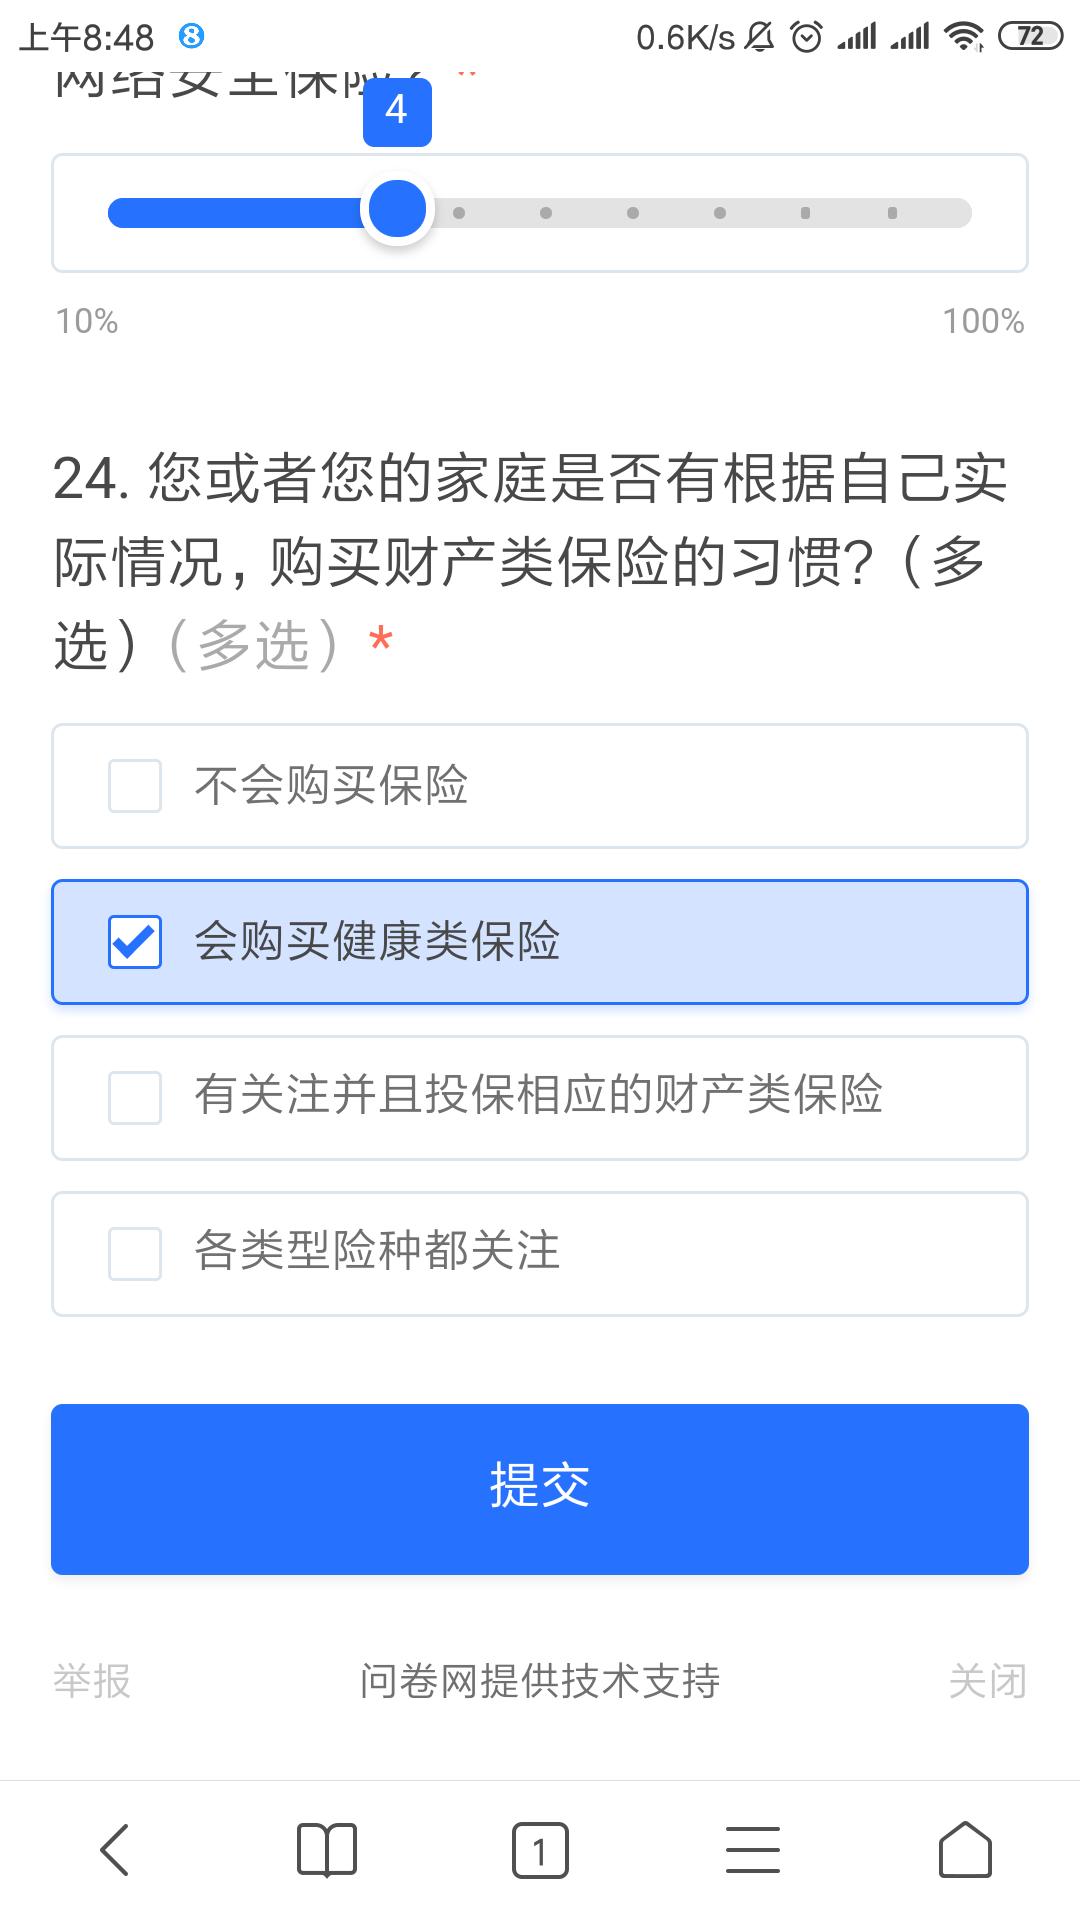 Screenshot_2019-04-22-08-48-17-394_com.android.browser.png